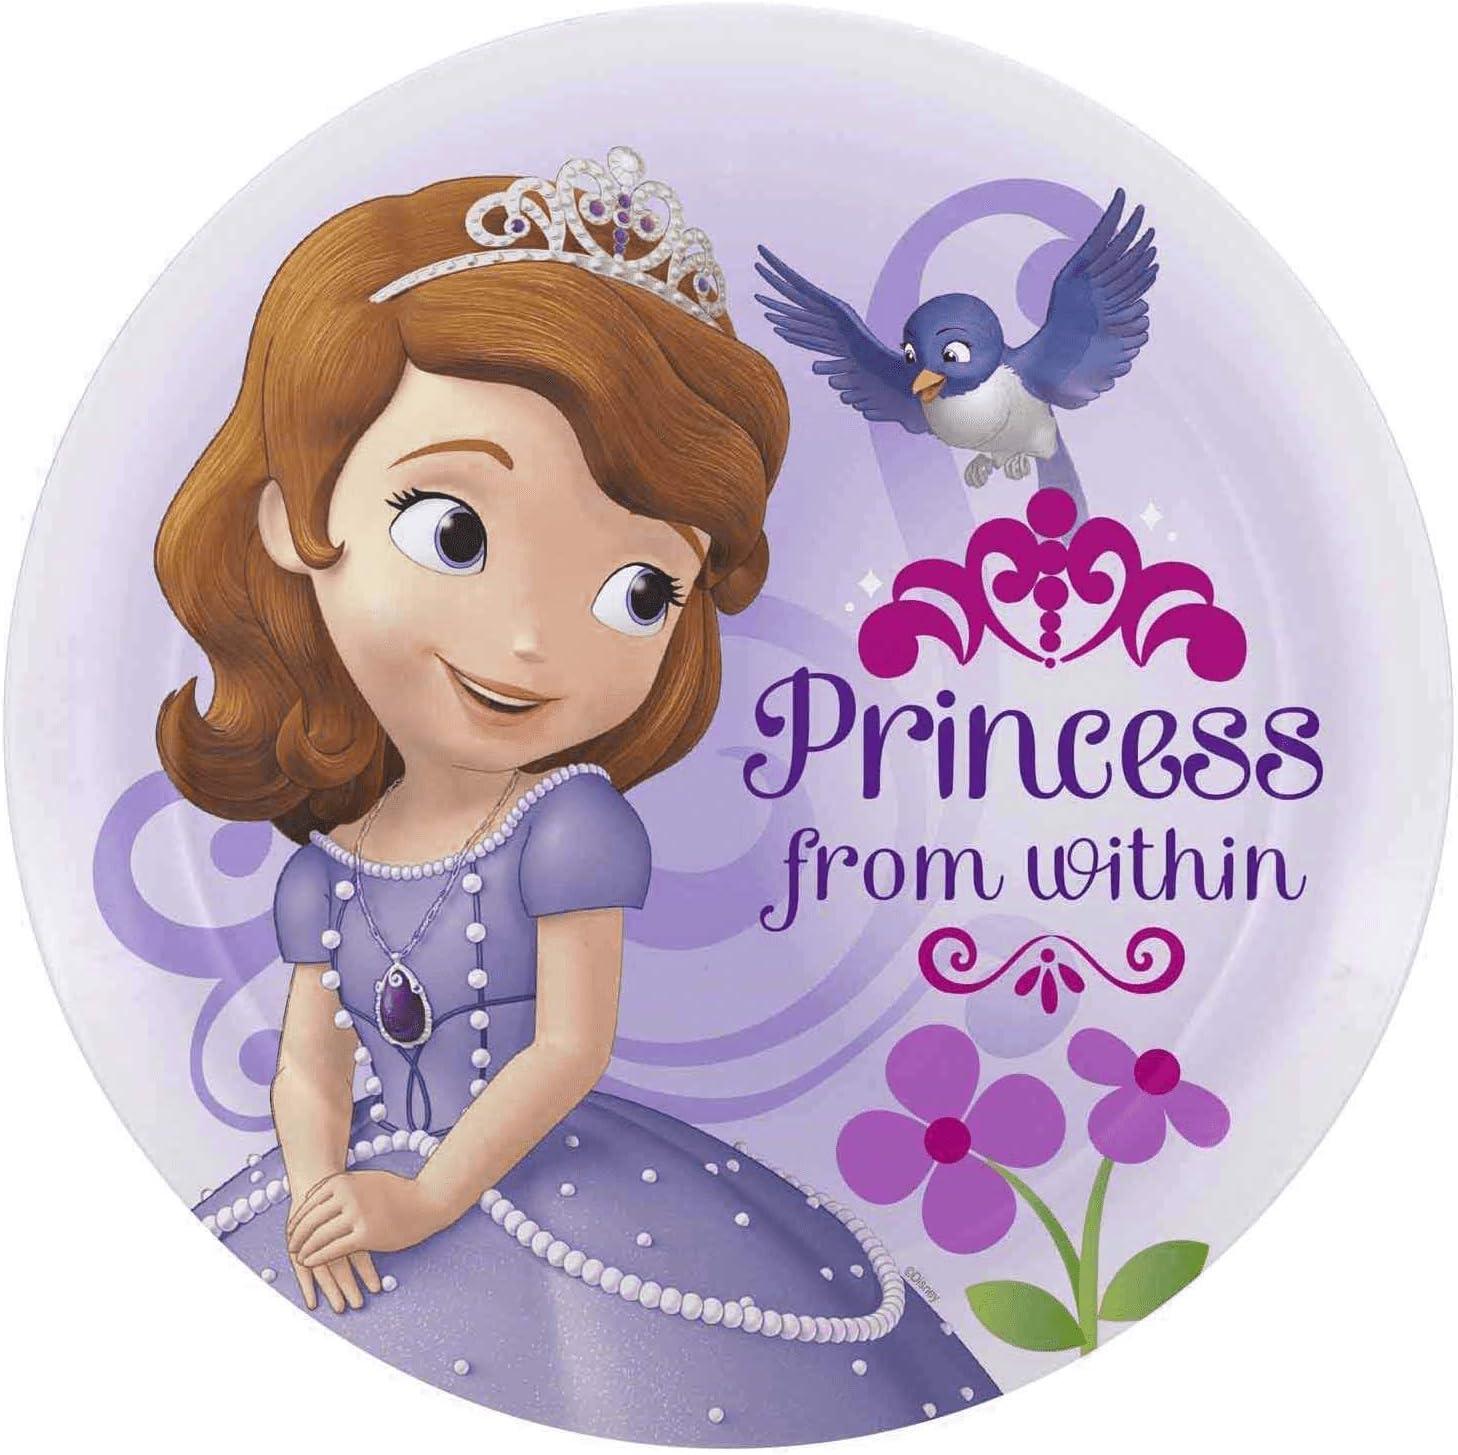 Amazon.com: Disney Zak Designs Princess Sofia The First 8 Inch Baby Toddler  Plate, BPA Free: Toys & Games